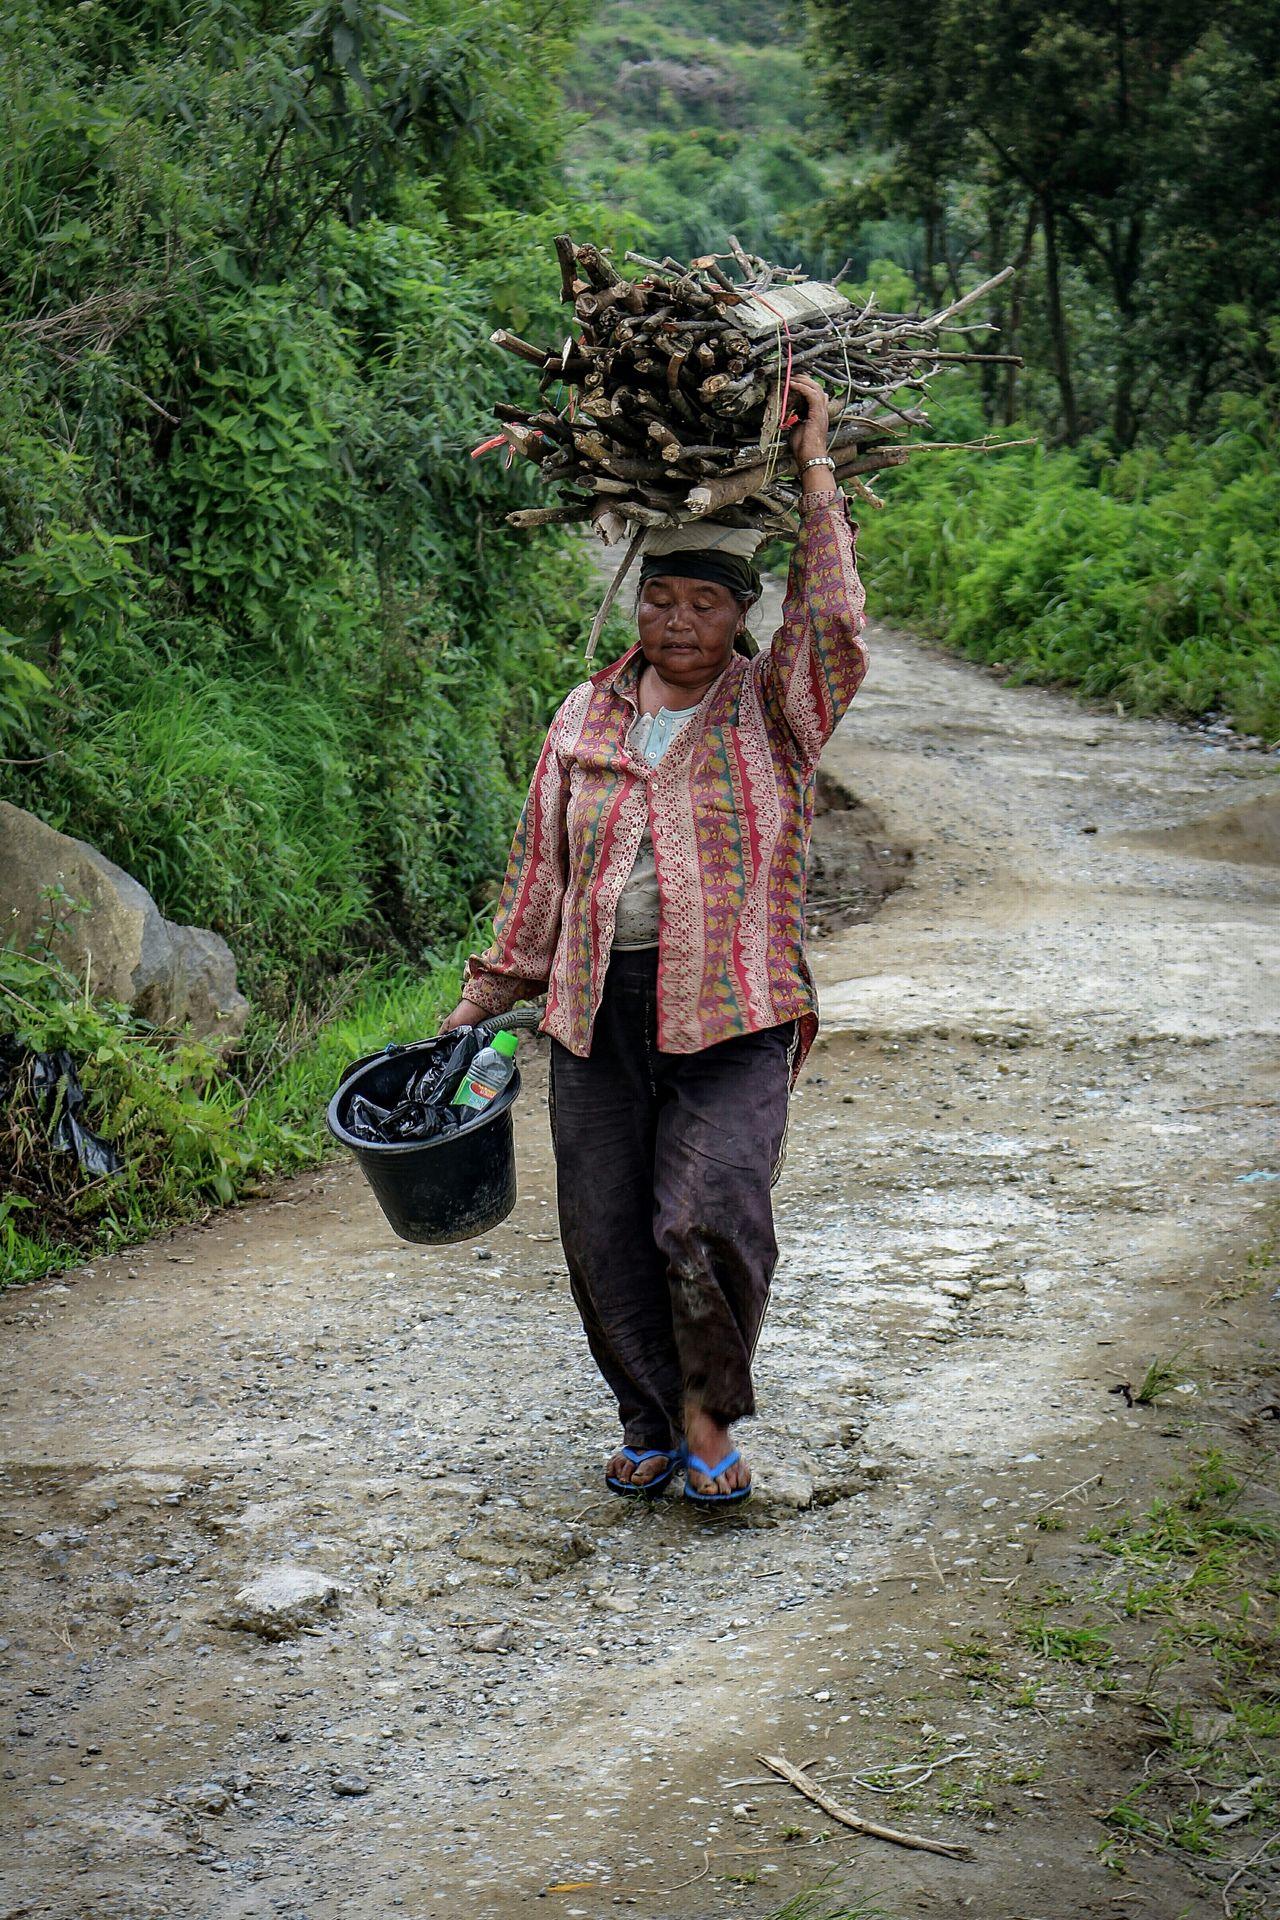 Women Around The World Humaninterest Photography Wonderfulindonesia